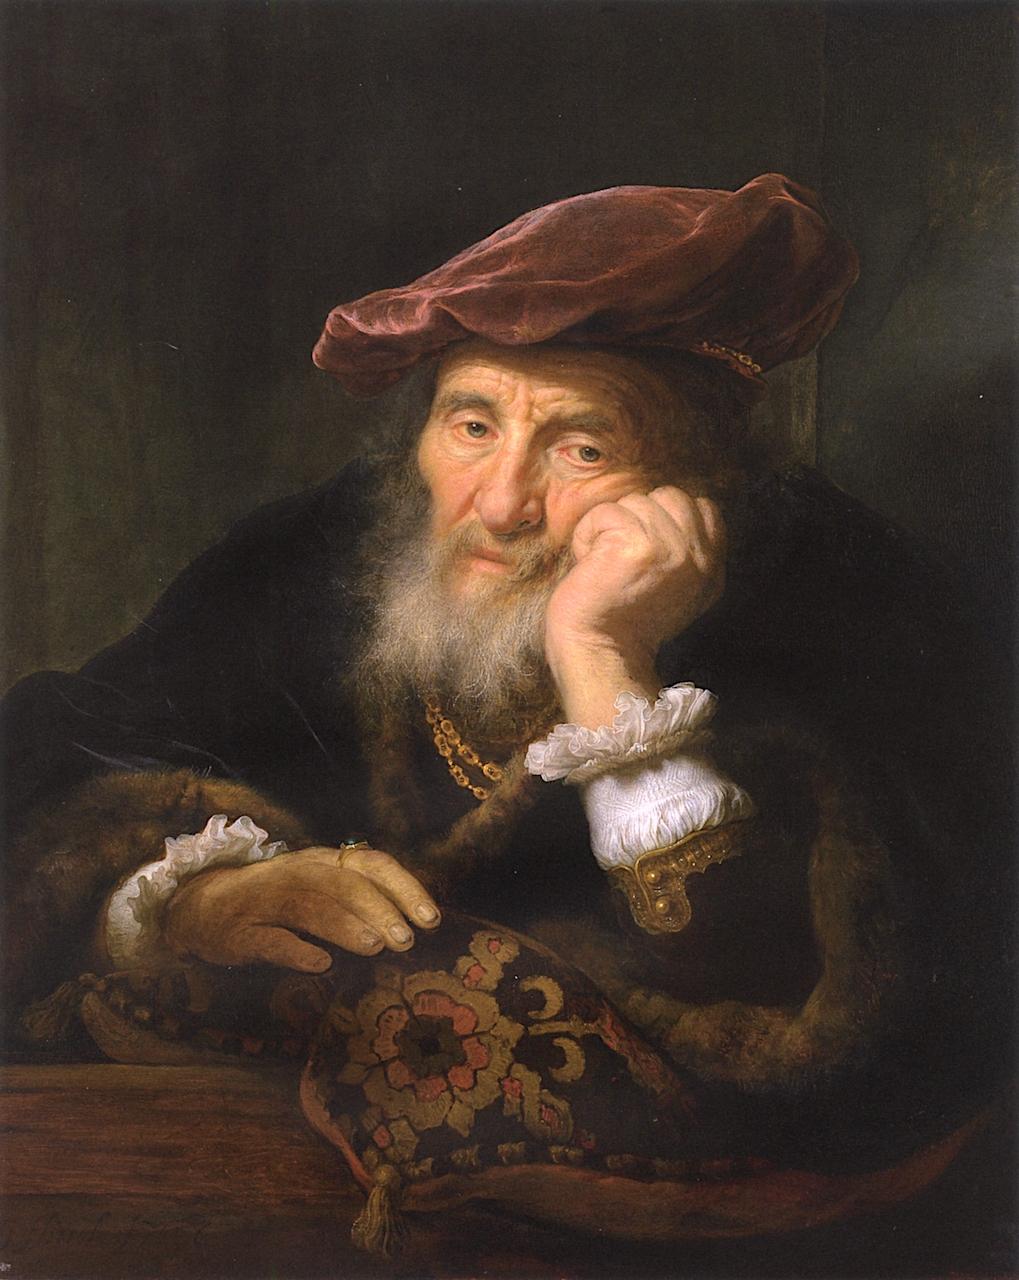 Govaert Flinck088